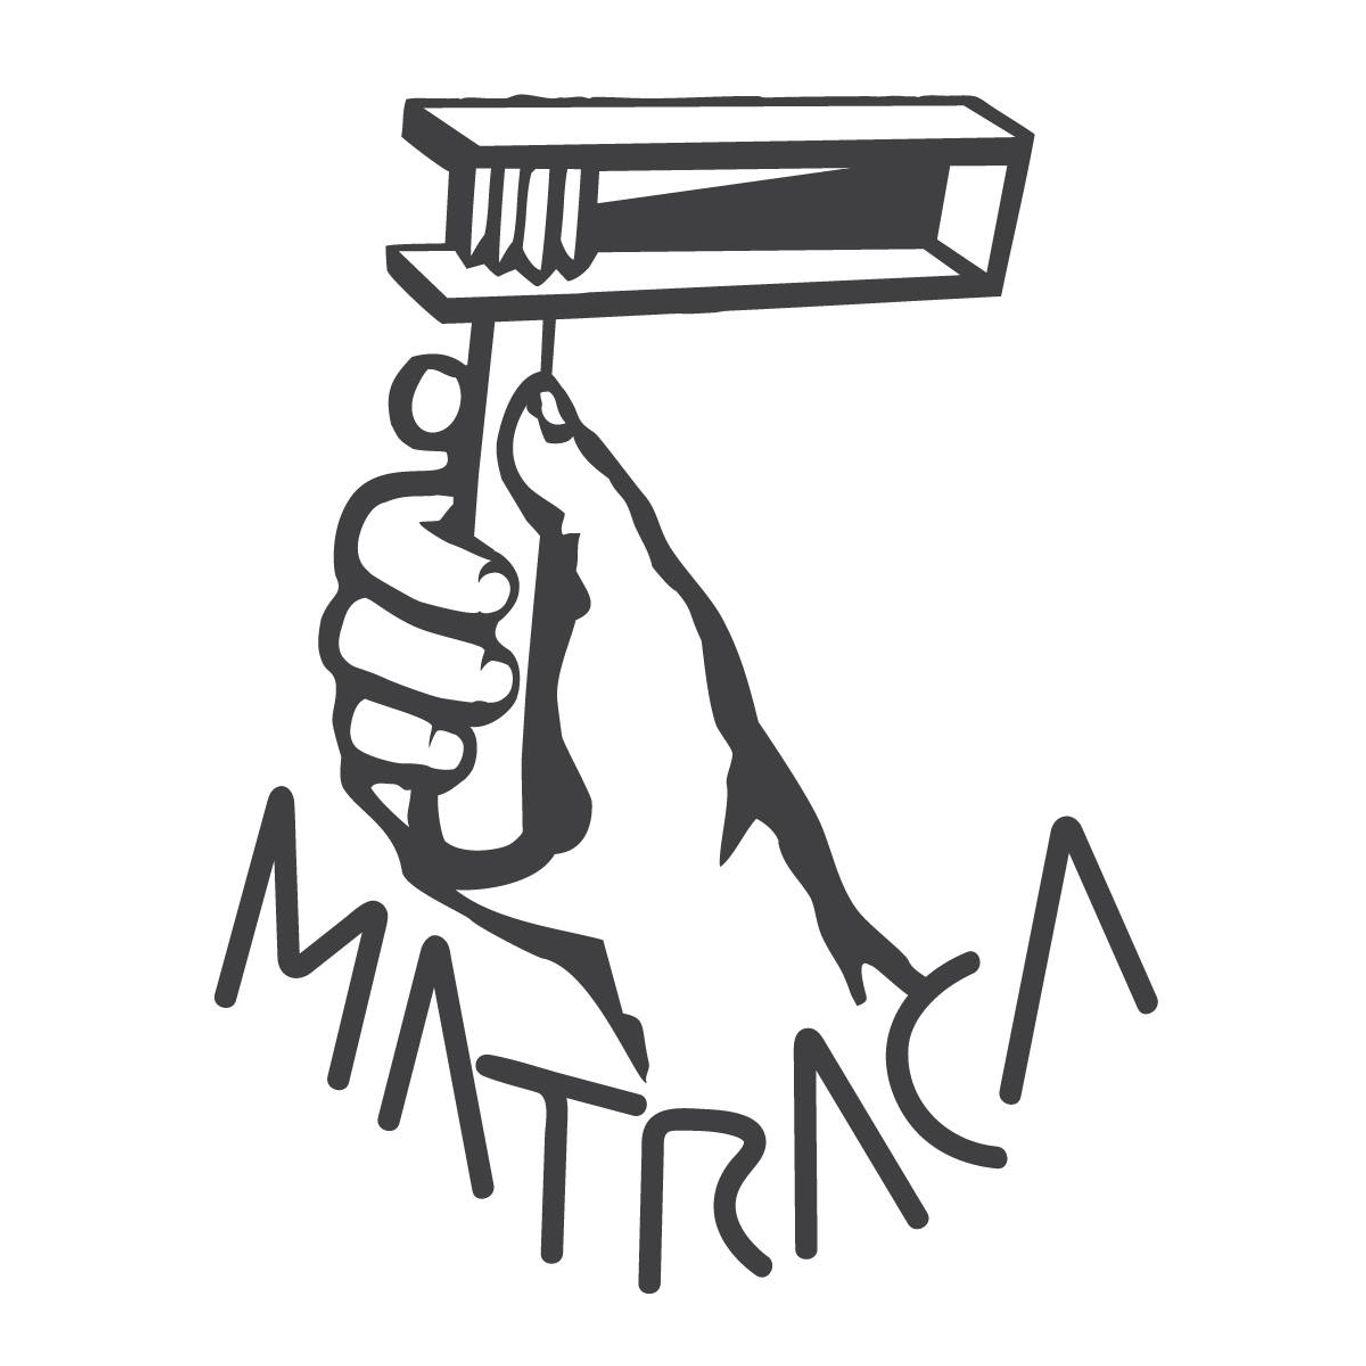 Matraca Records